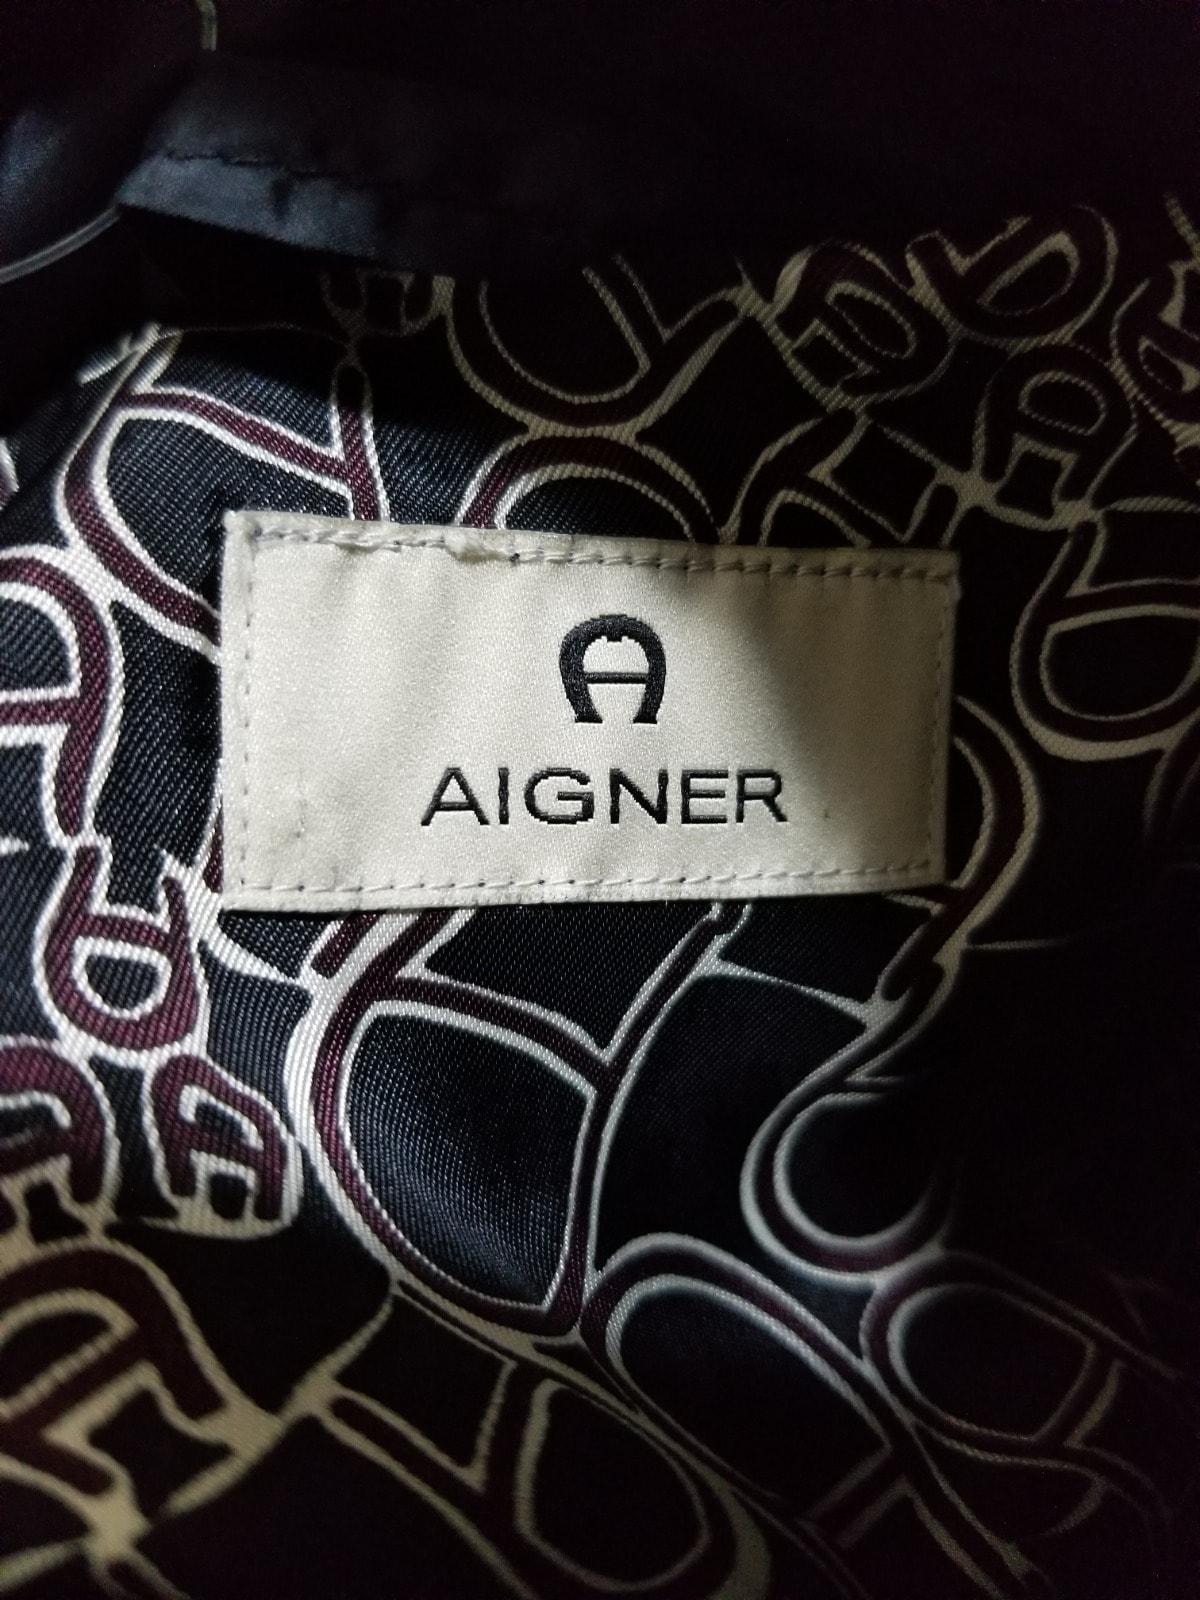 AIGNER(アイグナー)のダウンジャケット